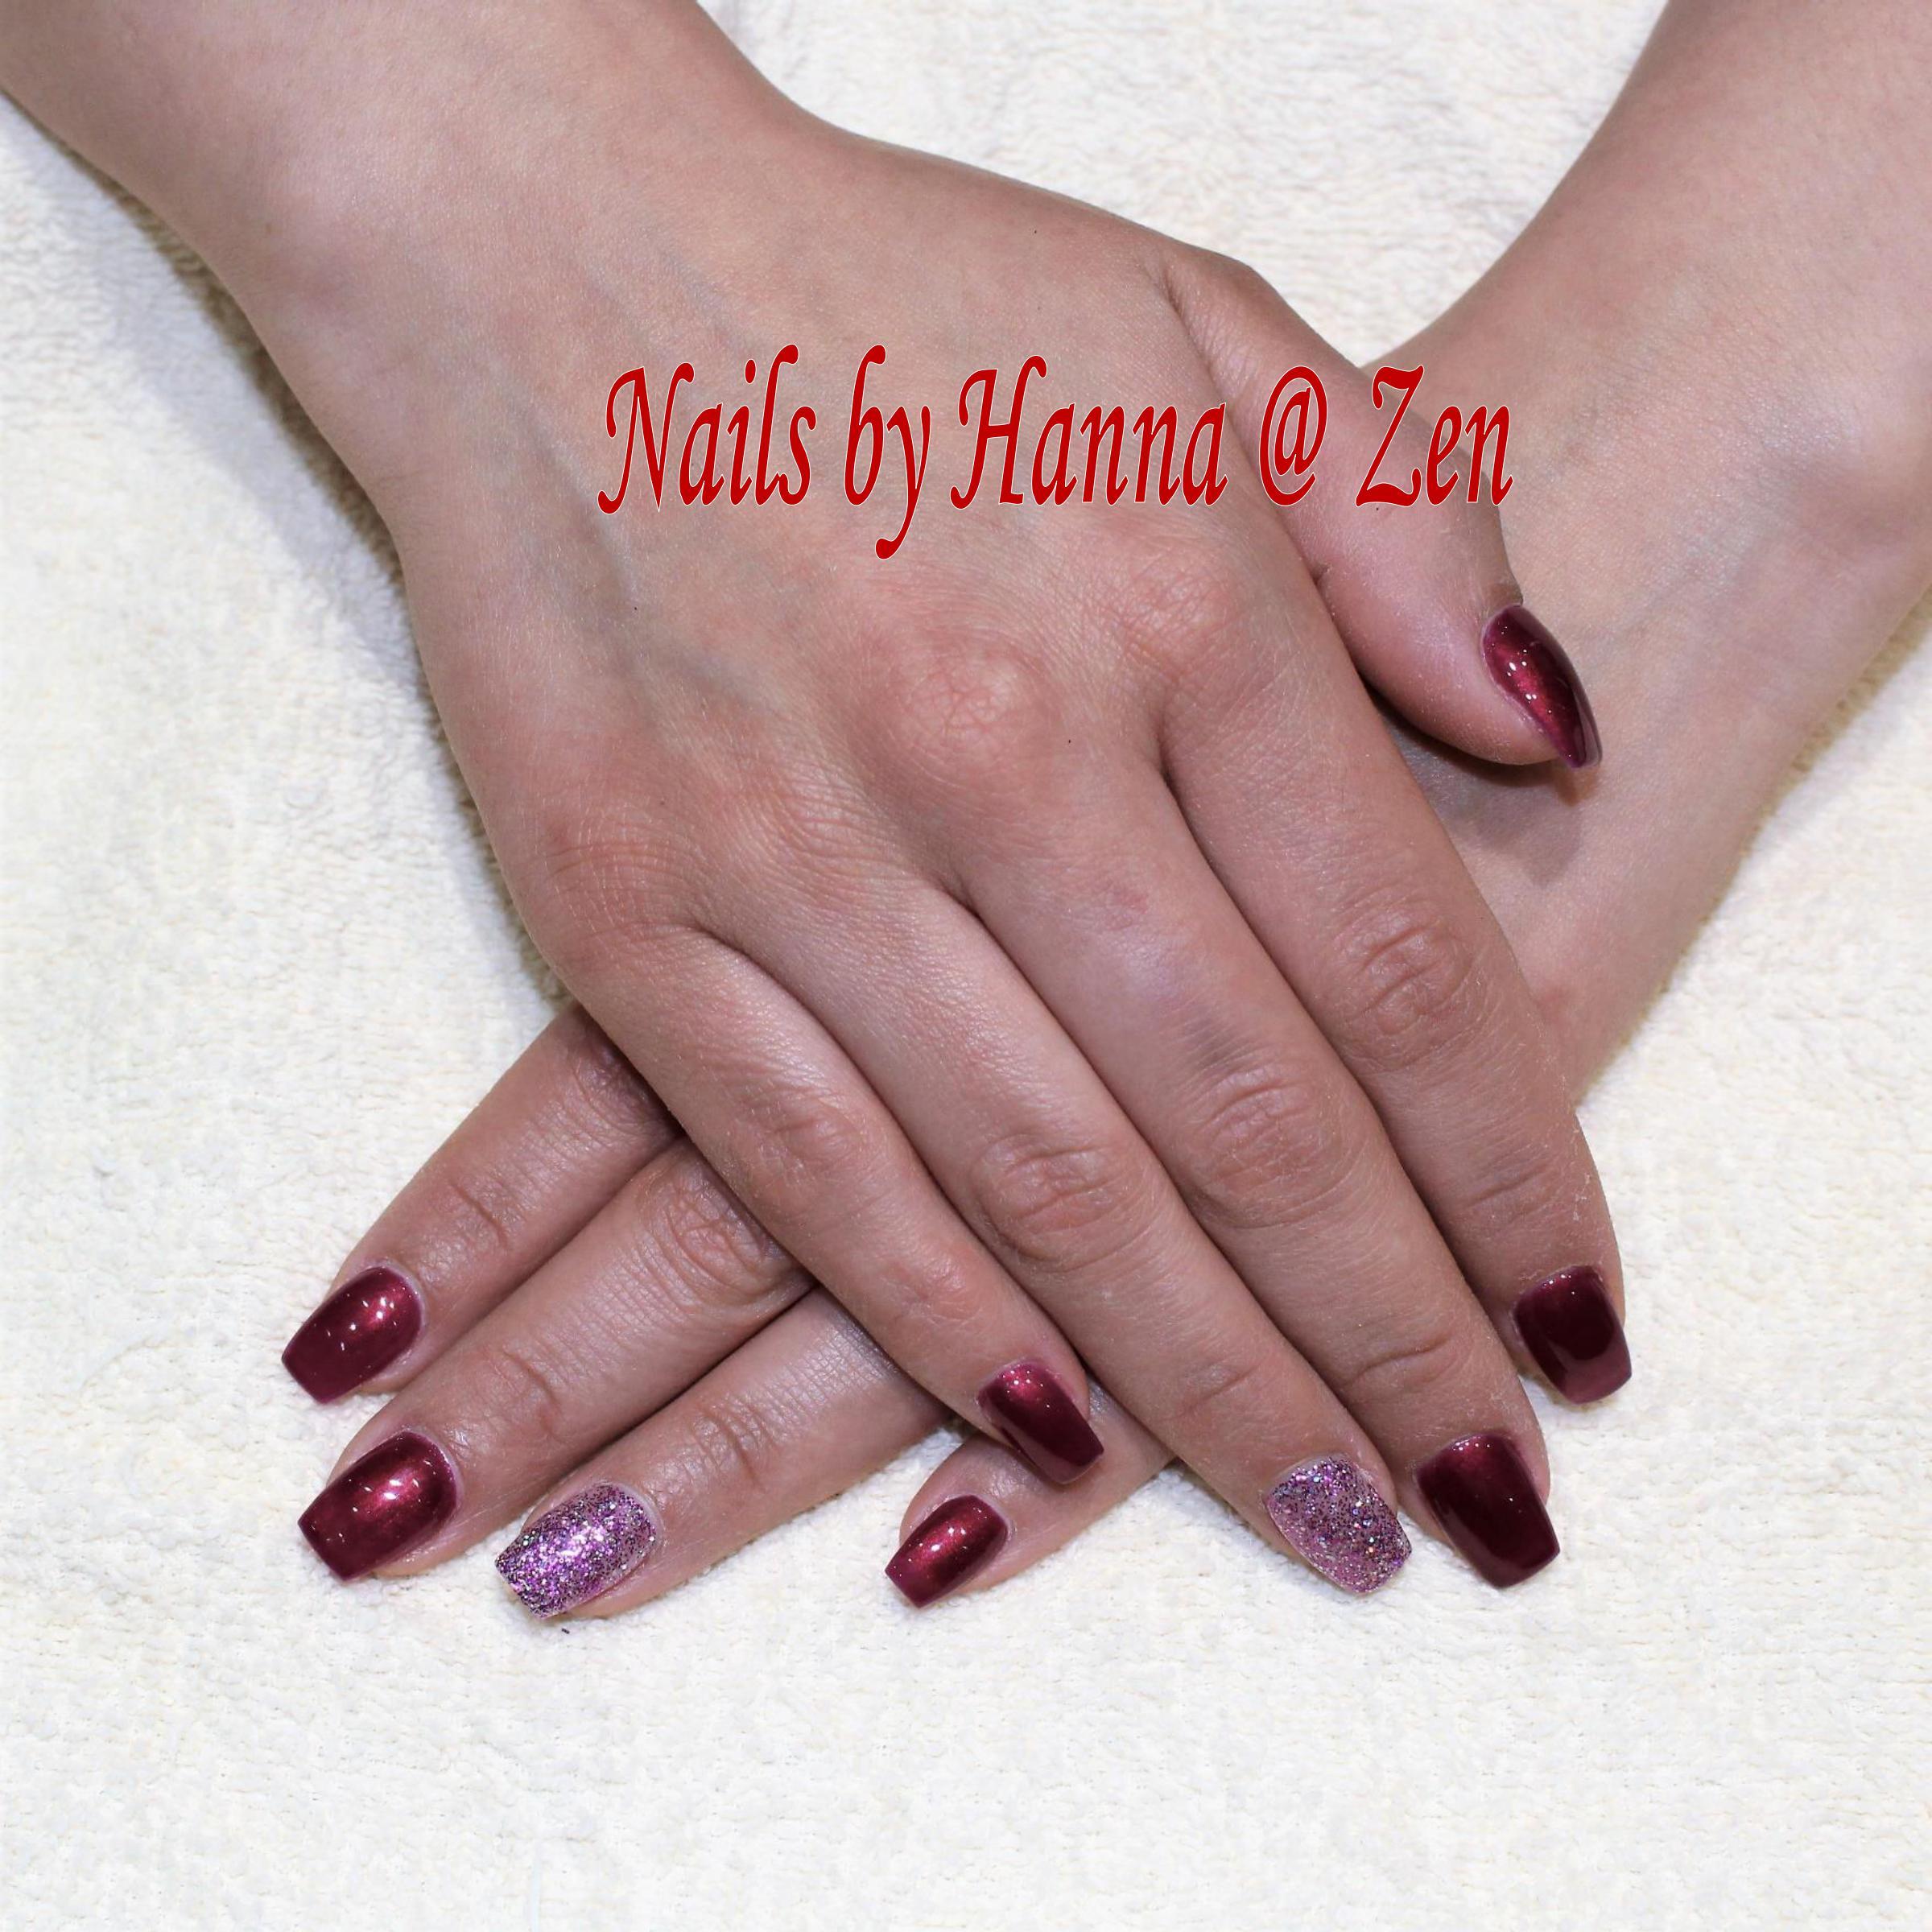 Nails by Hanna 0304